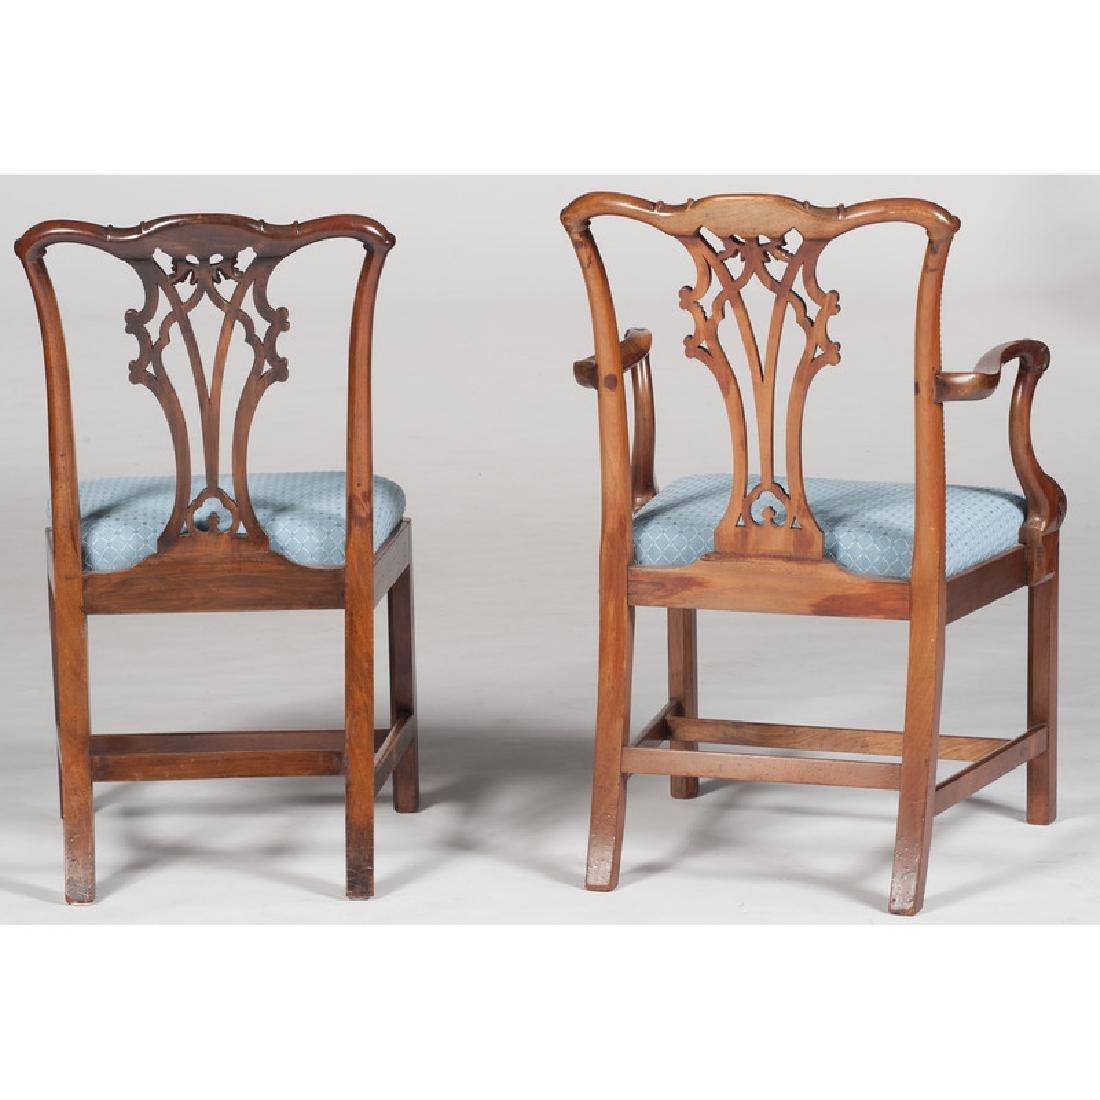 Twelve George III Chippendale Chairs - 4